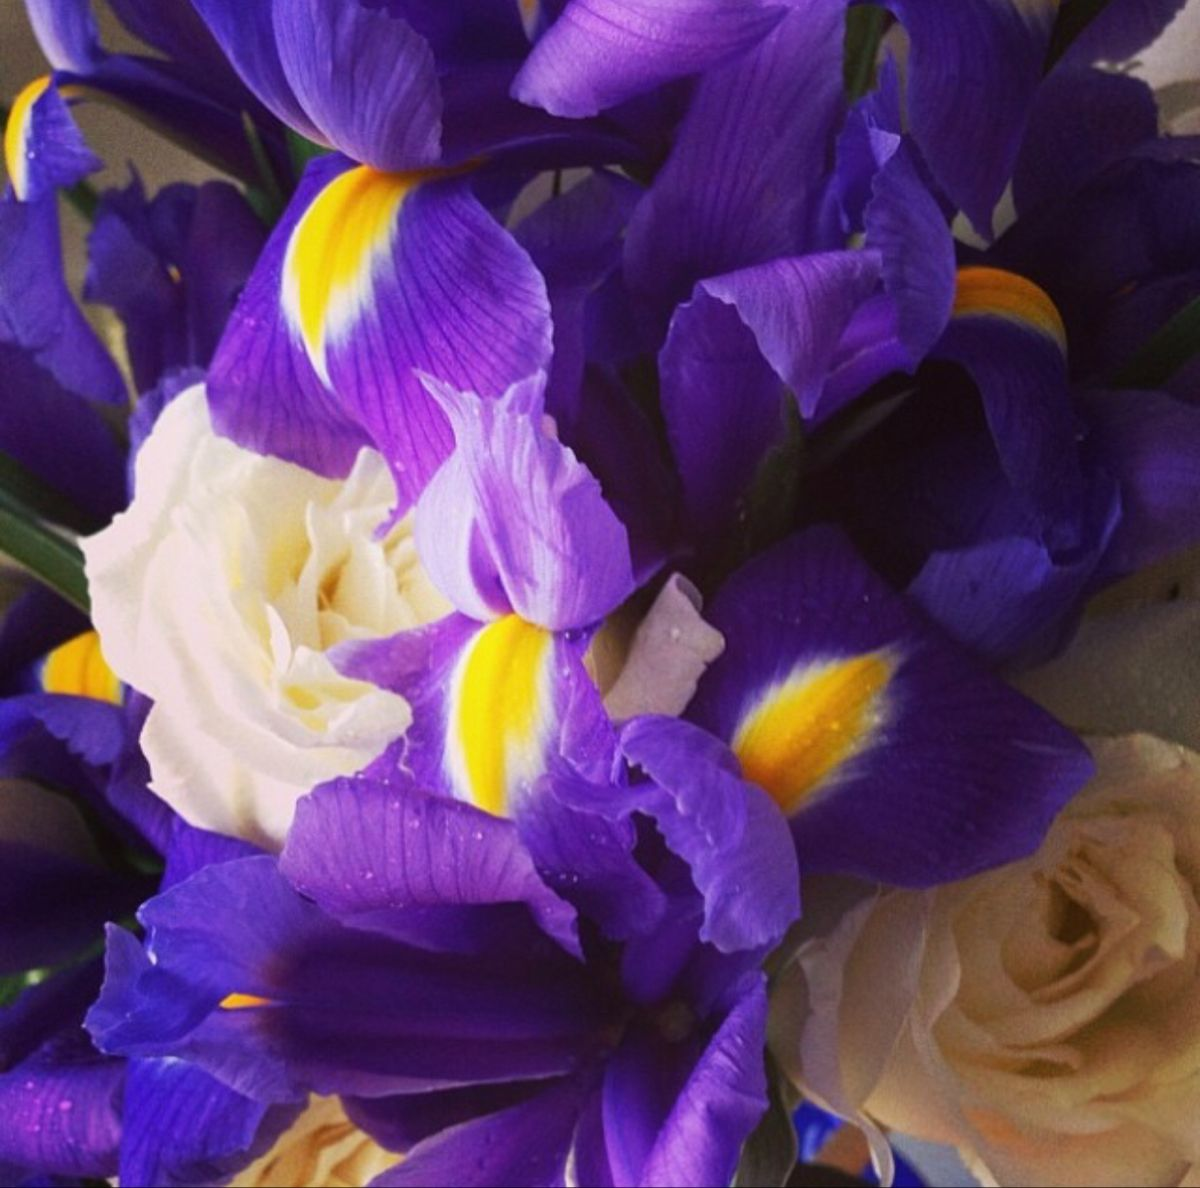 Iris Flower In 2020 Iris Flowers Flowers For Sale Flowers